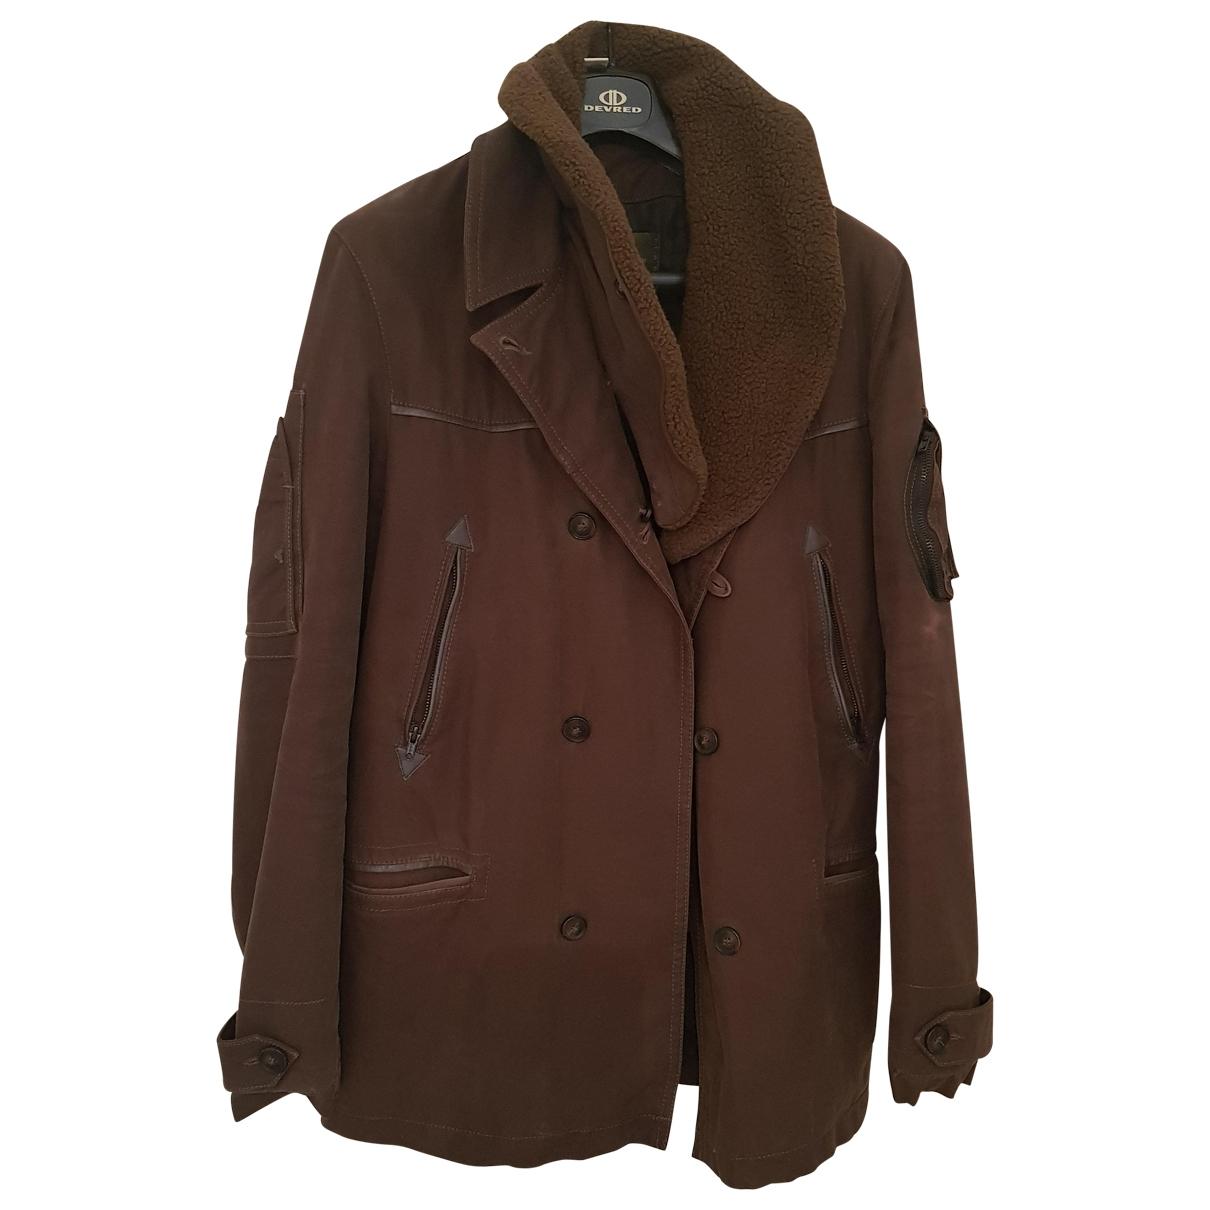 Ikks - Manteau   pour homme en toile - kaki